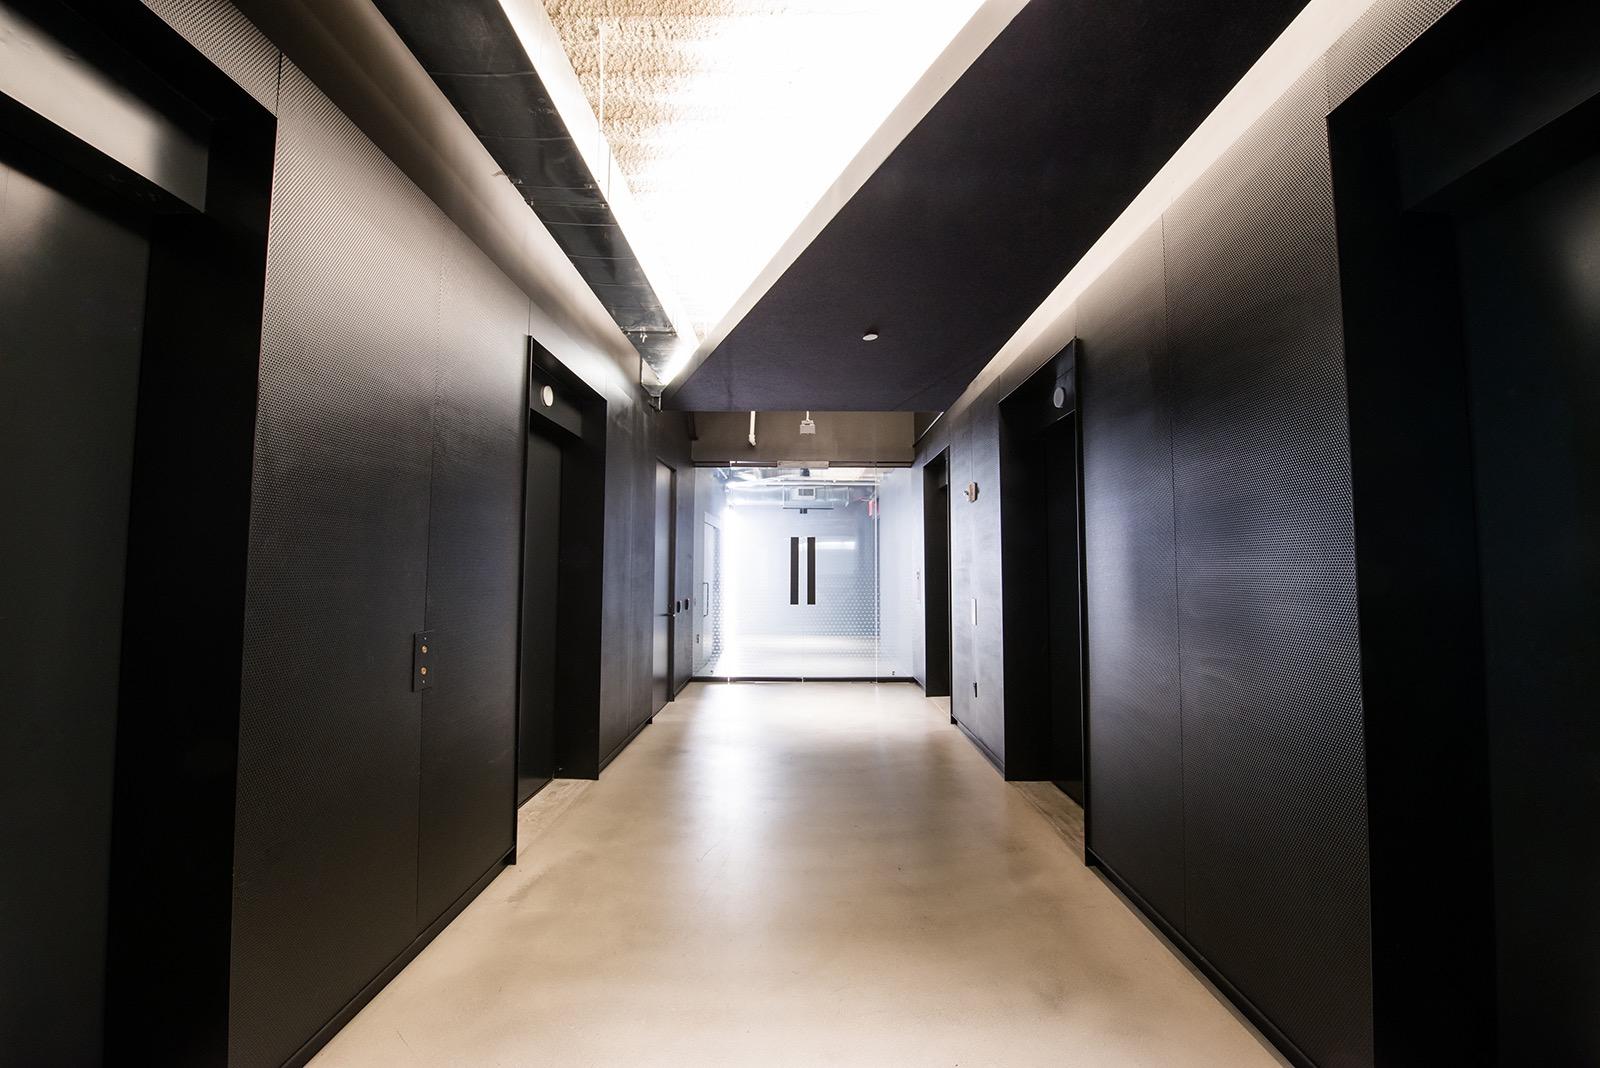 vox-media-nyc-office-15